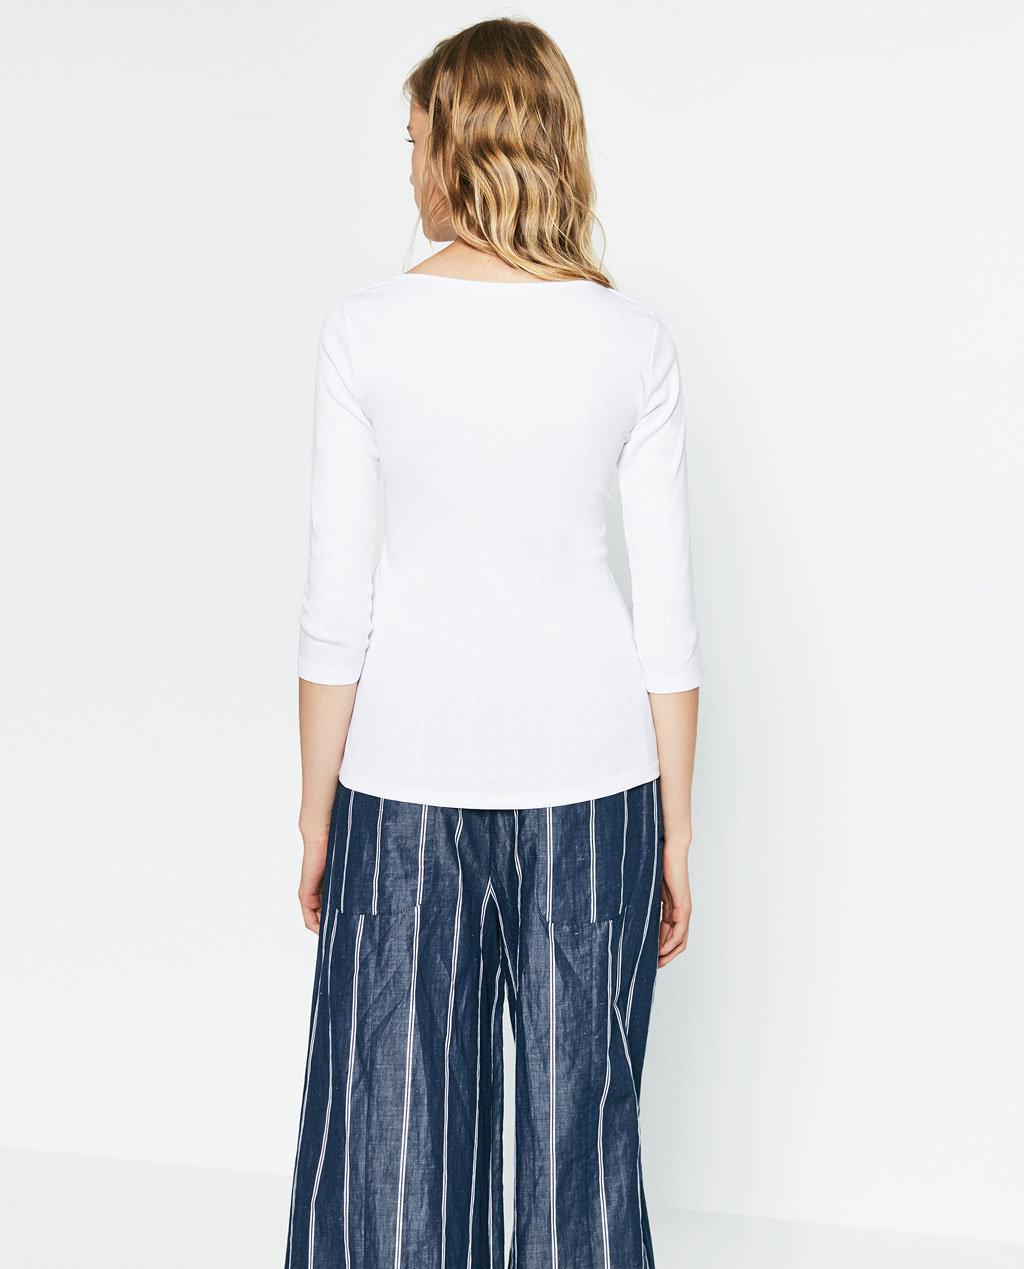 100% Cotton Women T-Shirt